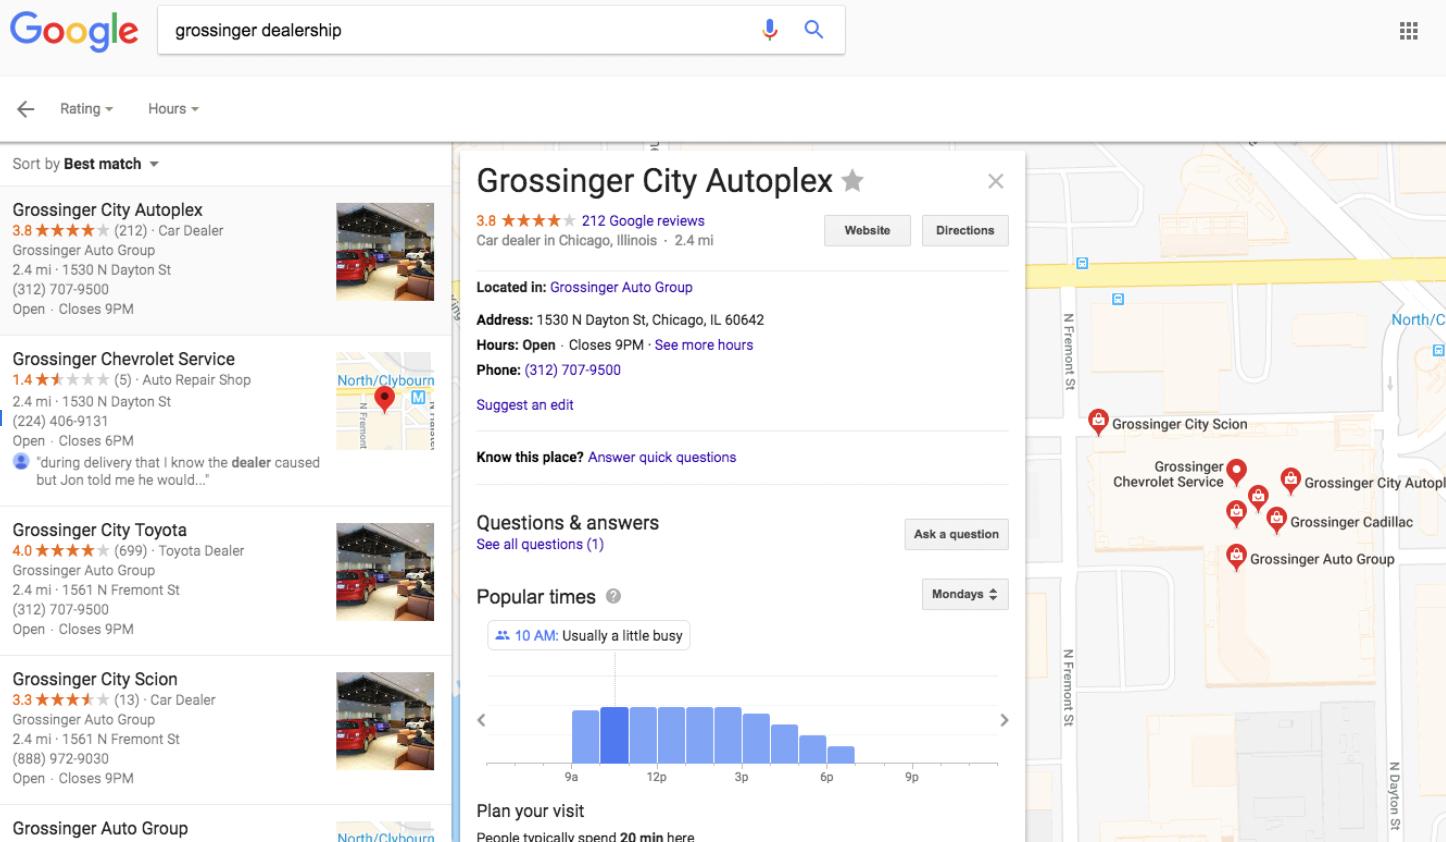 Grossinger City Autoplex GMB Listing